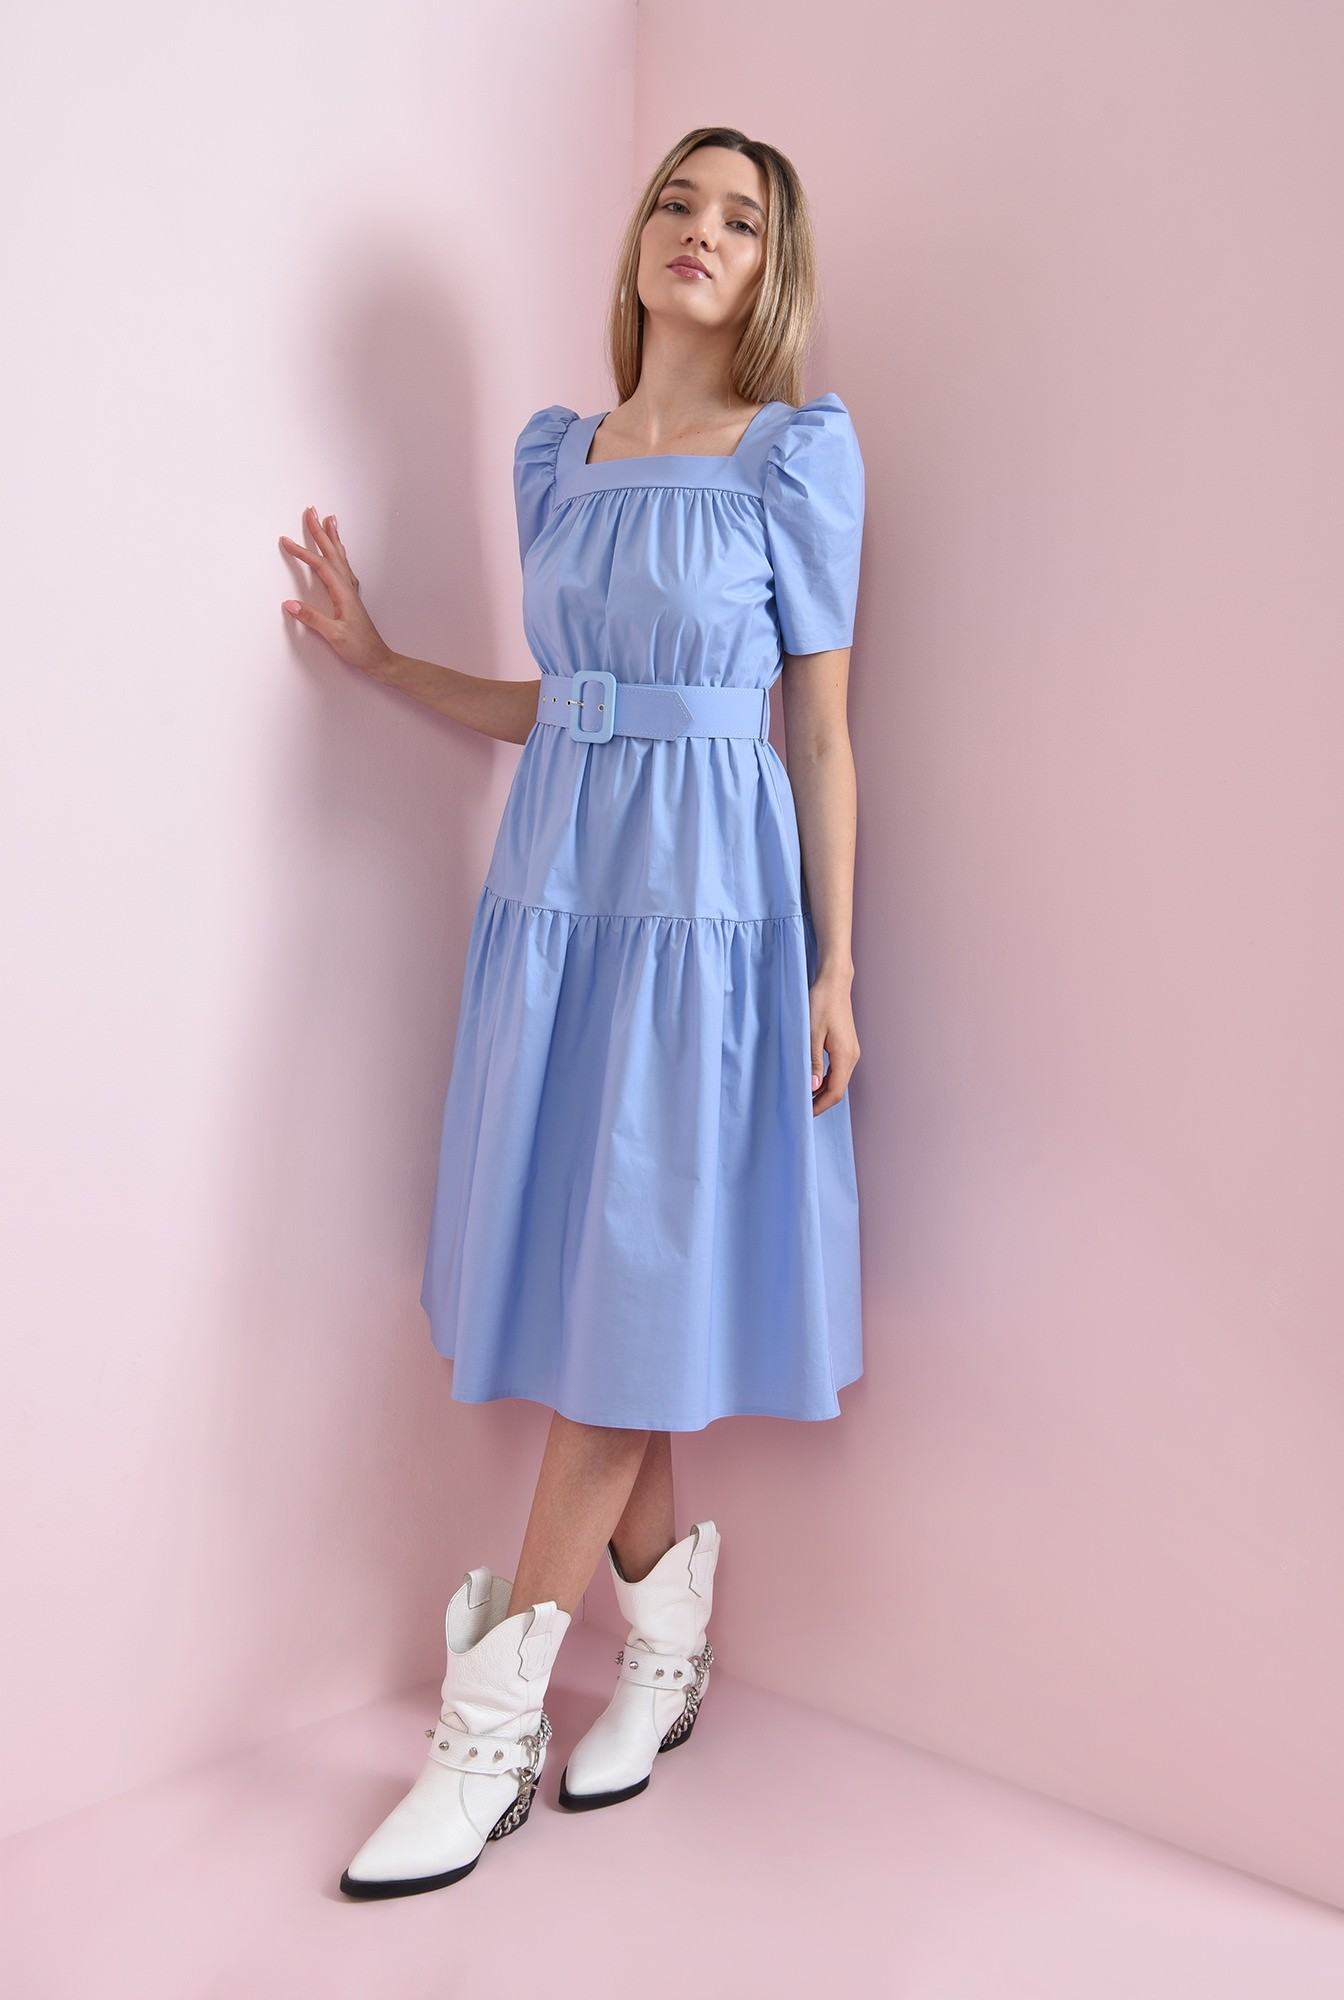 0 - rochie din bumbac, bleu, Poema